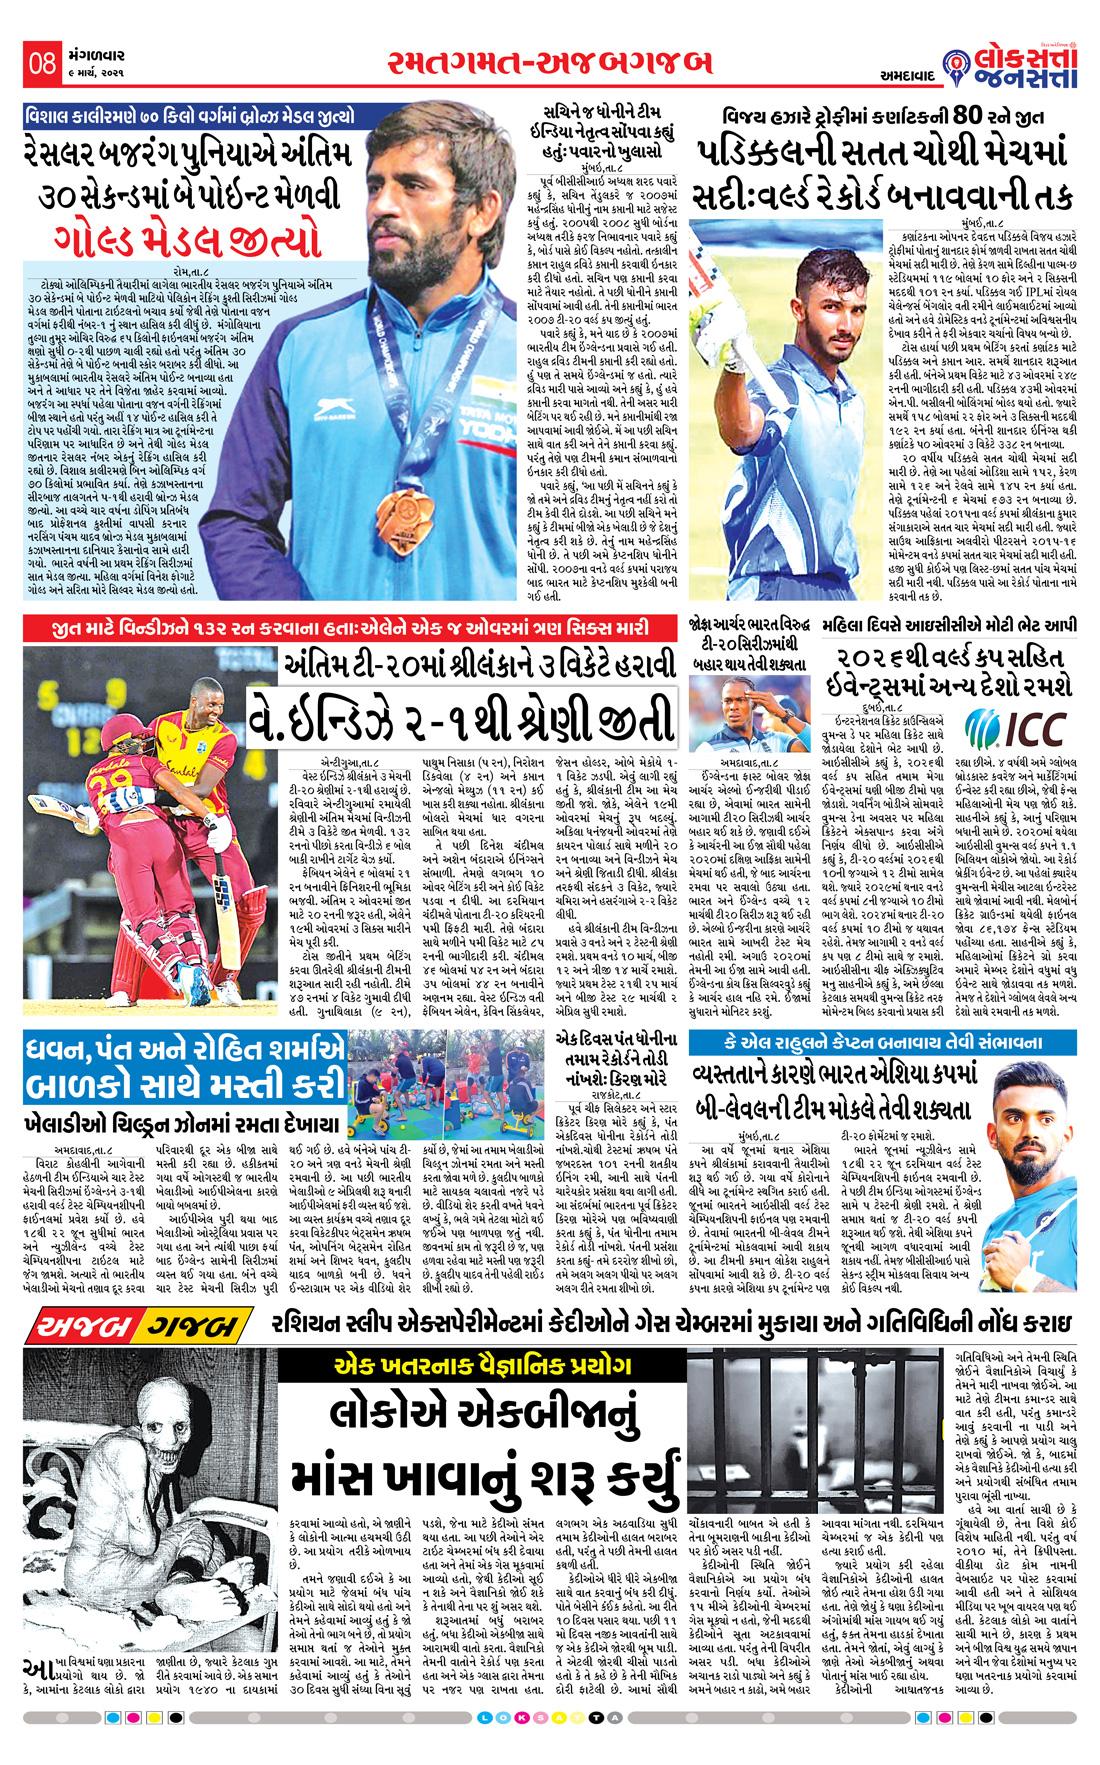 Loksatta Jansatta News Papaer E-paper dated 2021-03-09 | Page 9